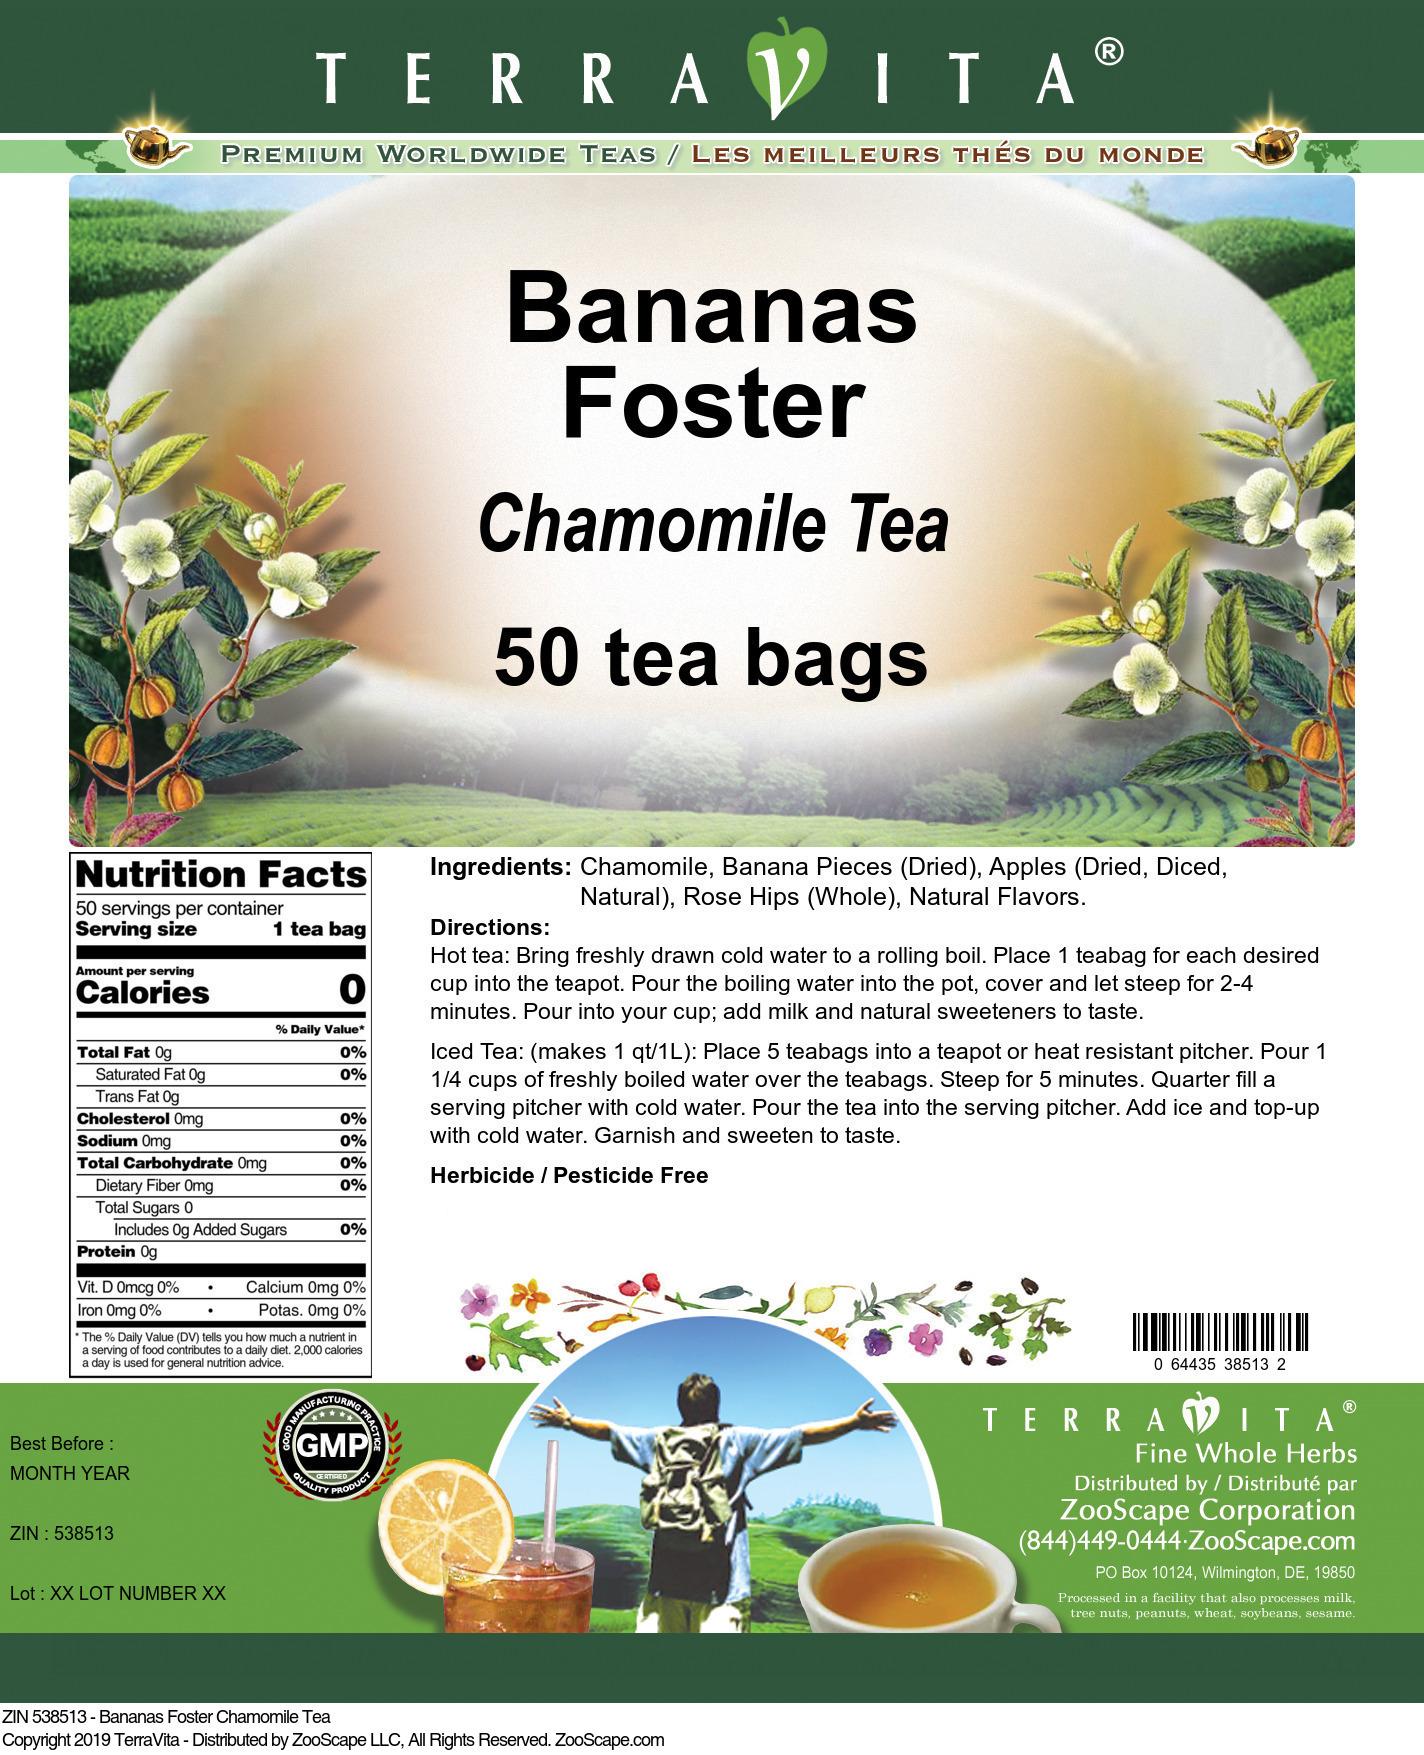 Bananas Foster Chamomile Tea